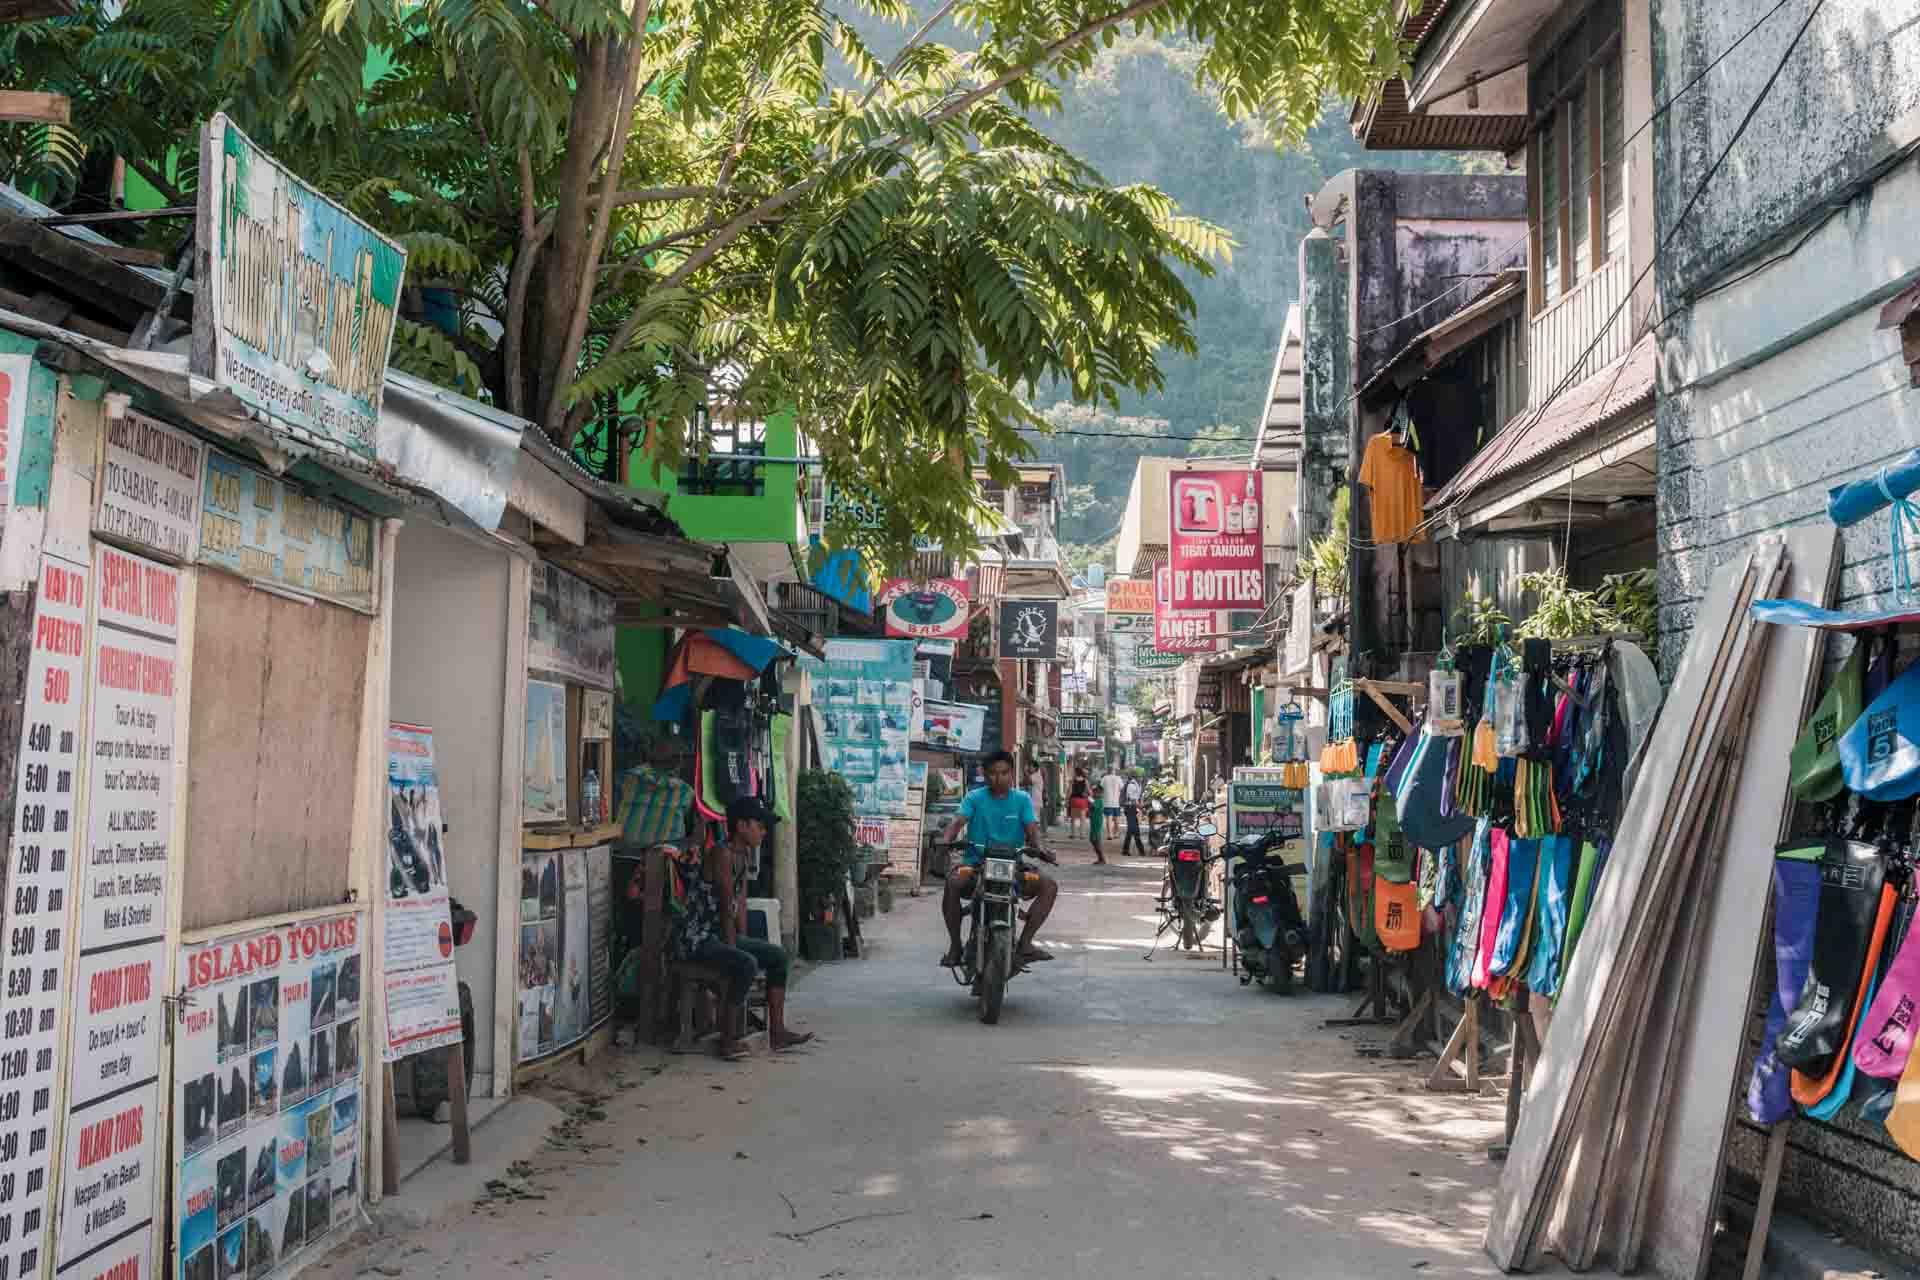 Narrow street in El Nido Town